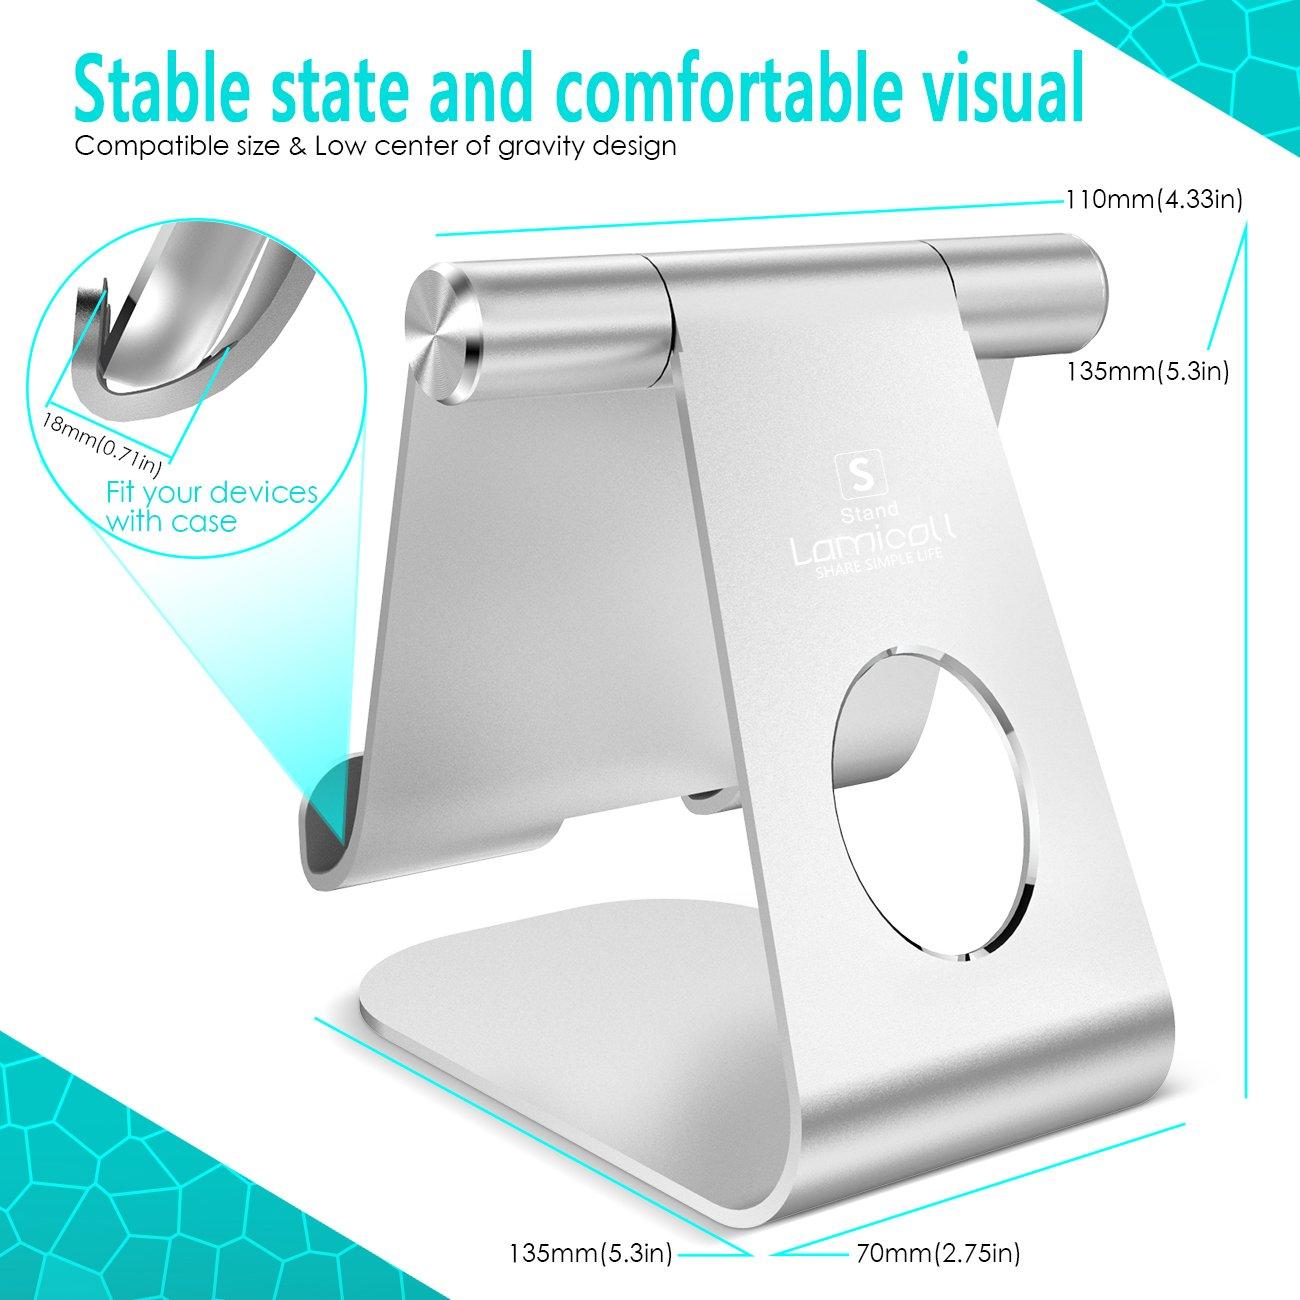 Pad mini 2 3 4 Pad Air Air 2 Soporte Tablet plata Otras Tablets Samsung Tab Lamicall Multi/ángulo Soporte Tablet : Soporte Base Ajustable para Tablets para Pad 2018 Pro 10.5 // 9.7 // 12.9